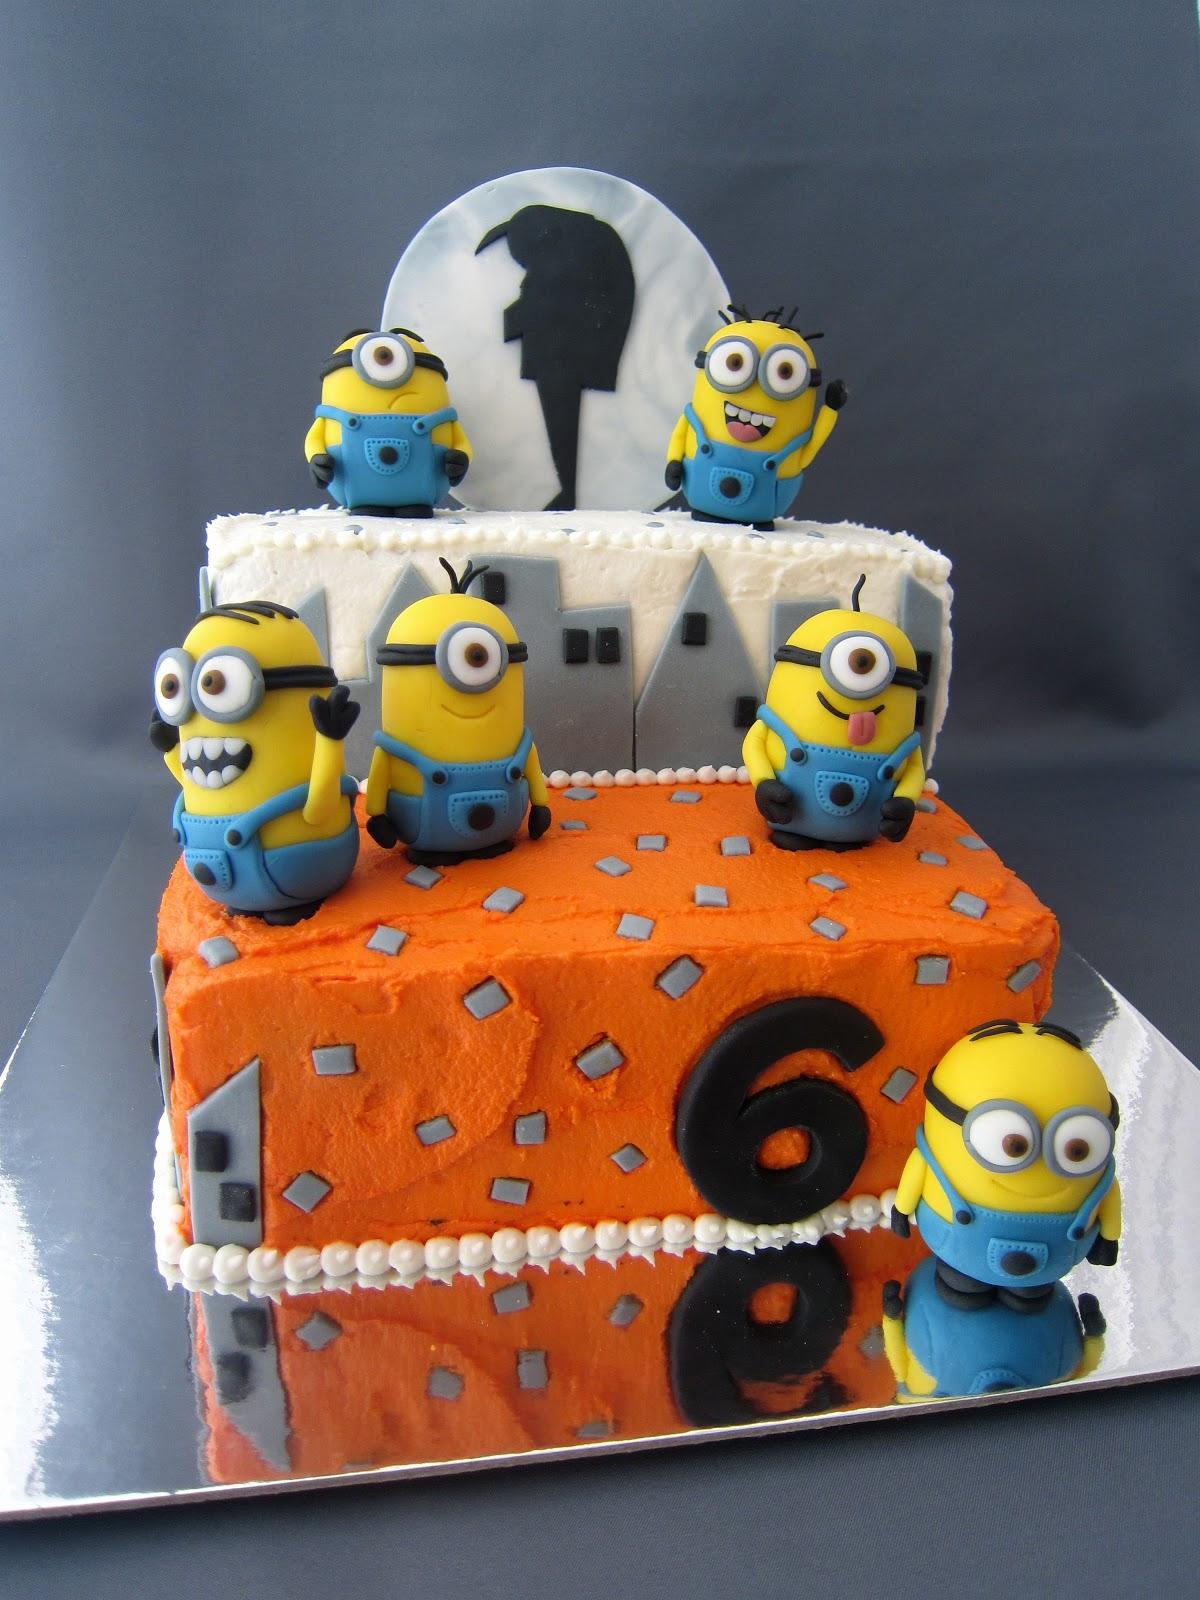 Clever Wren Despicable Me Minion Cake